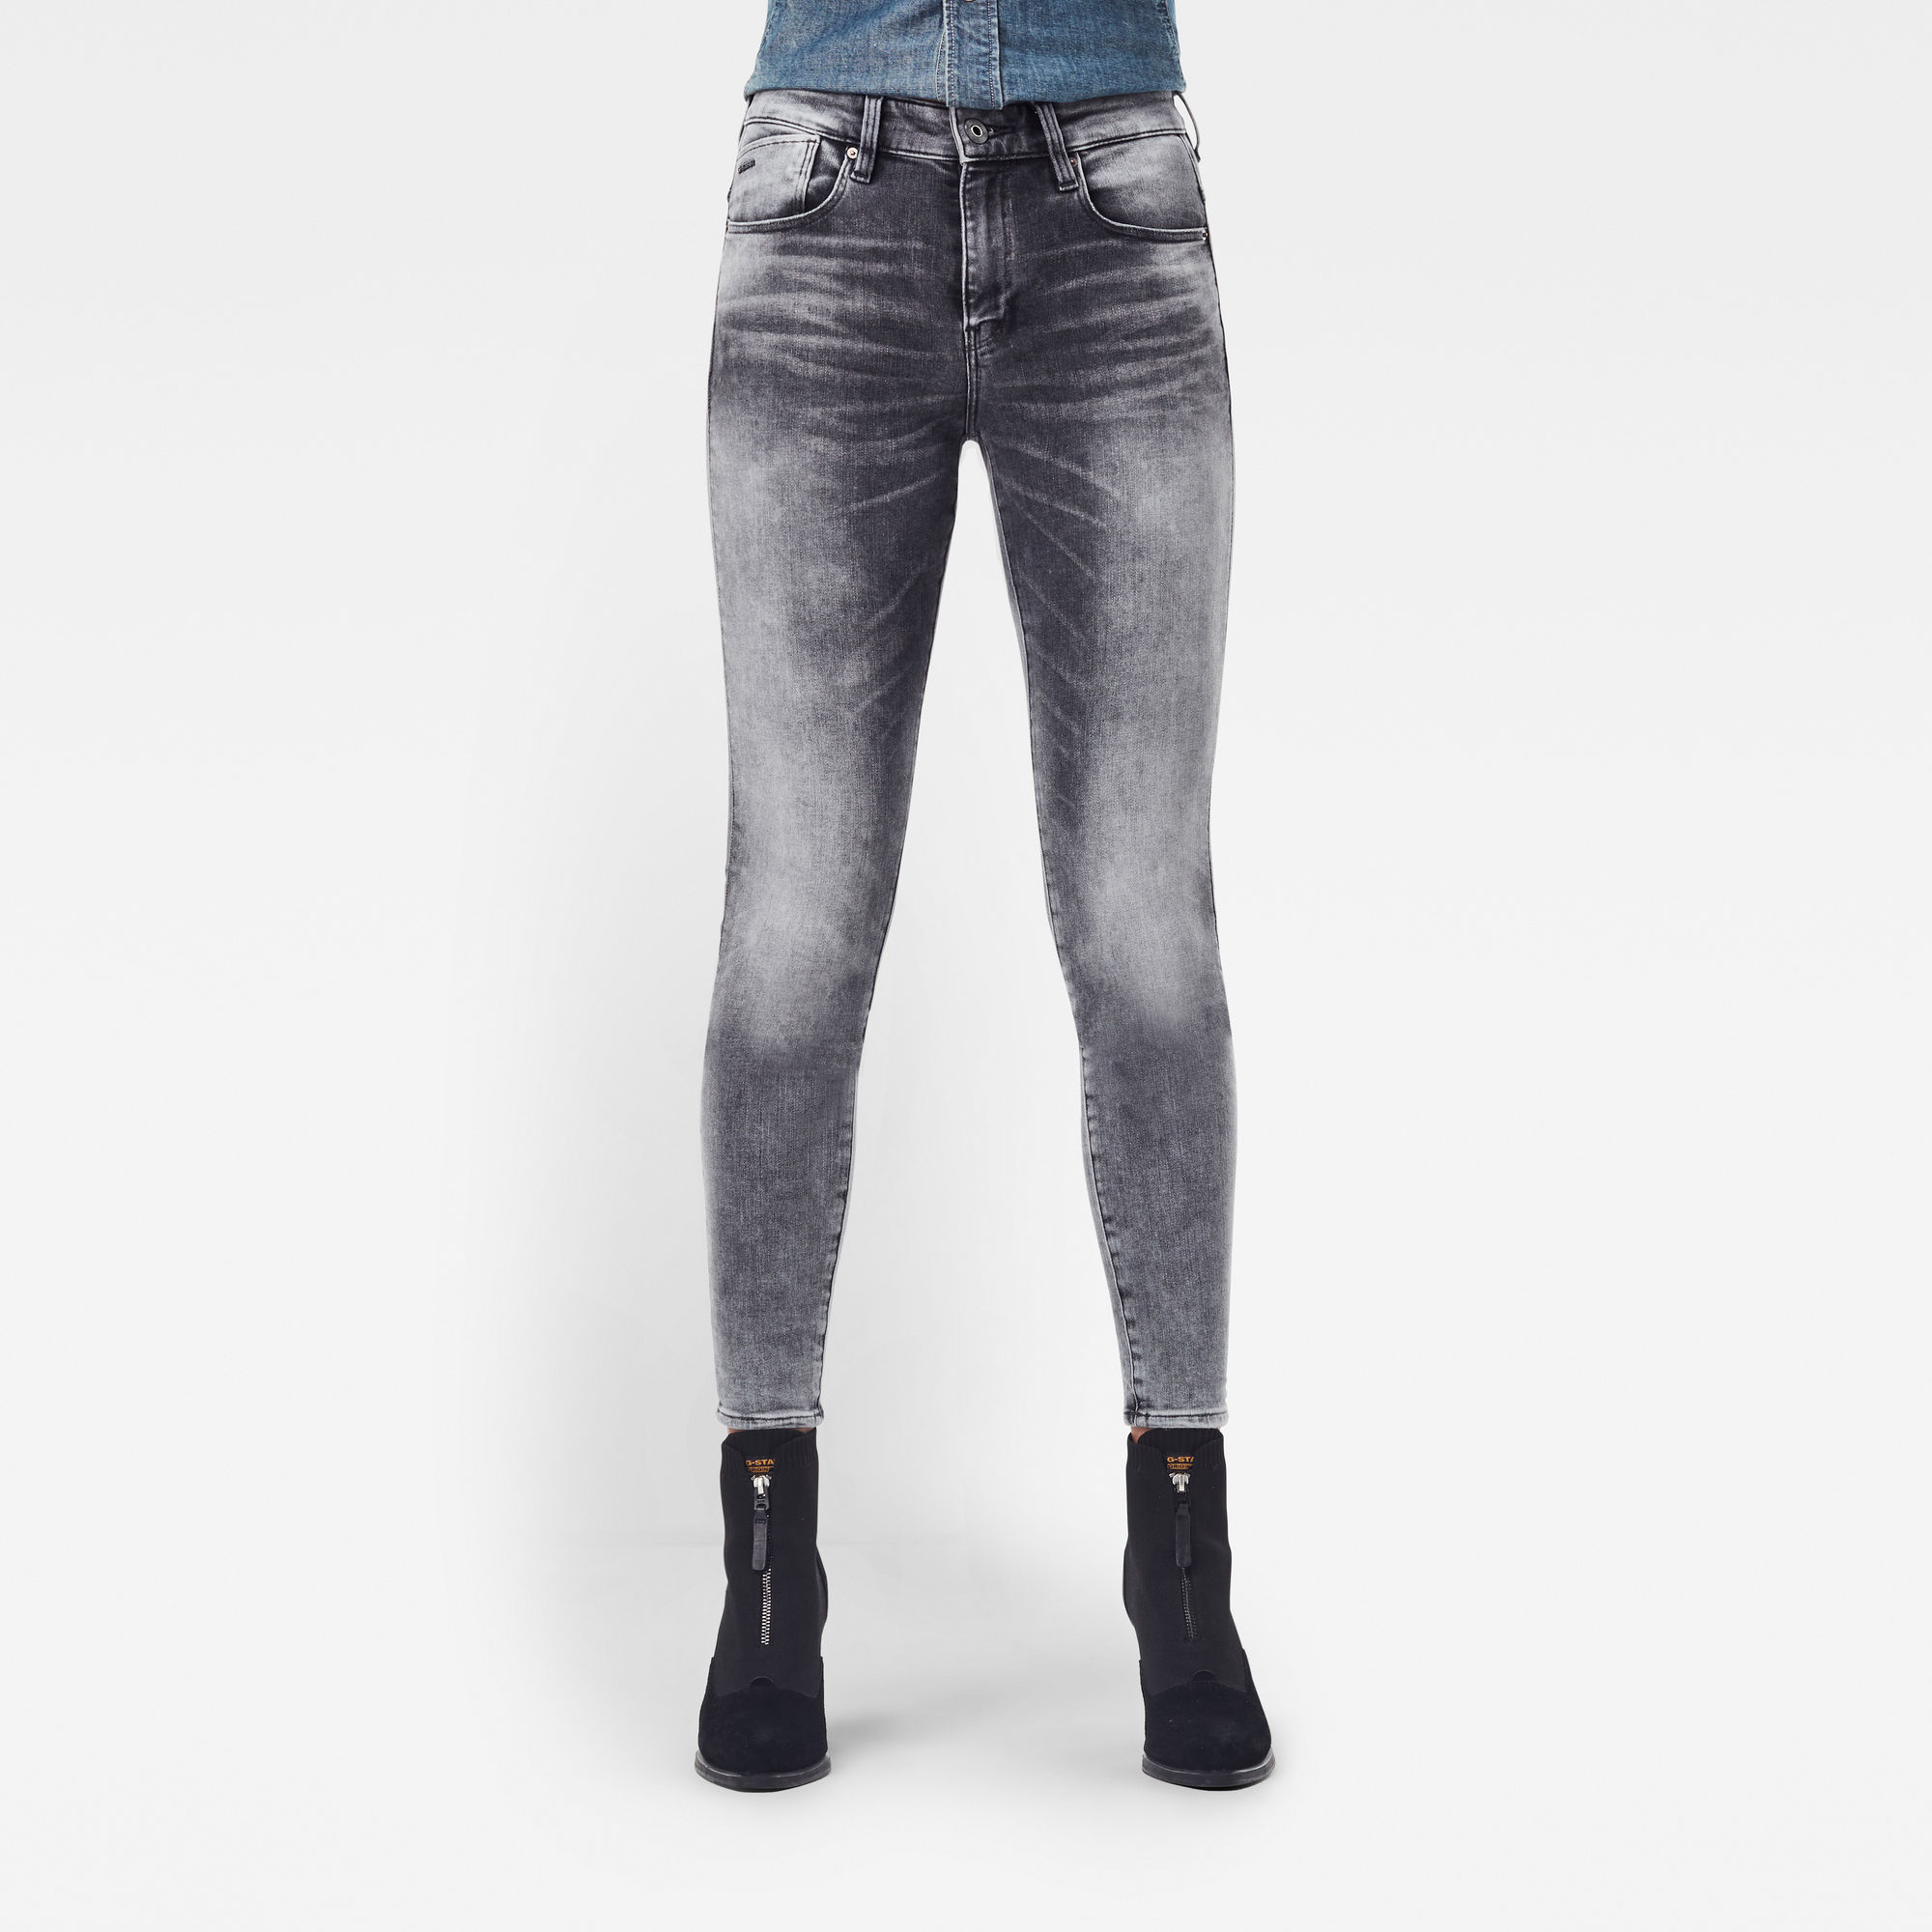 G-Star RAW Dames Lhana Skinny Jeans Grijs